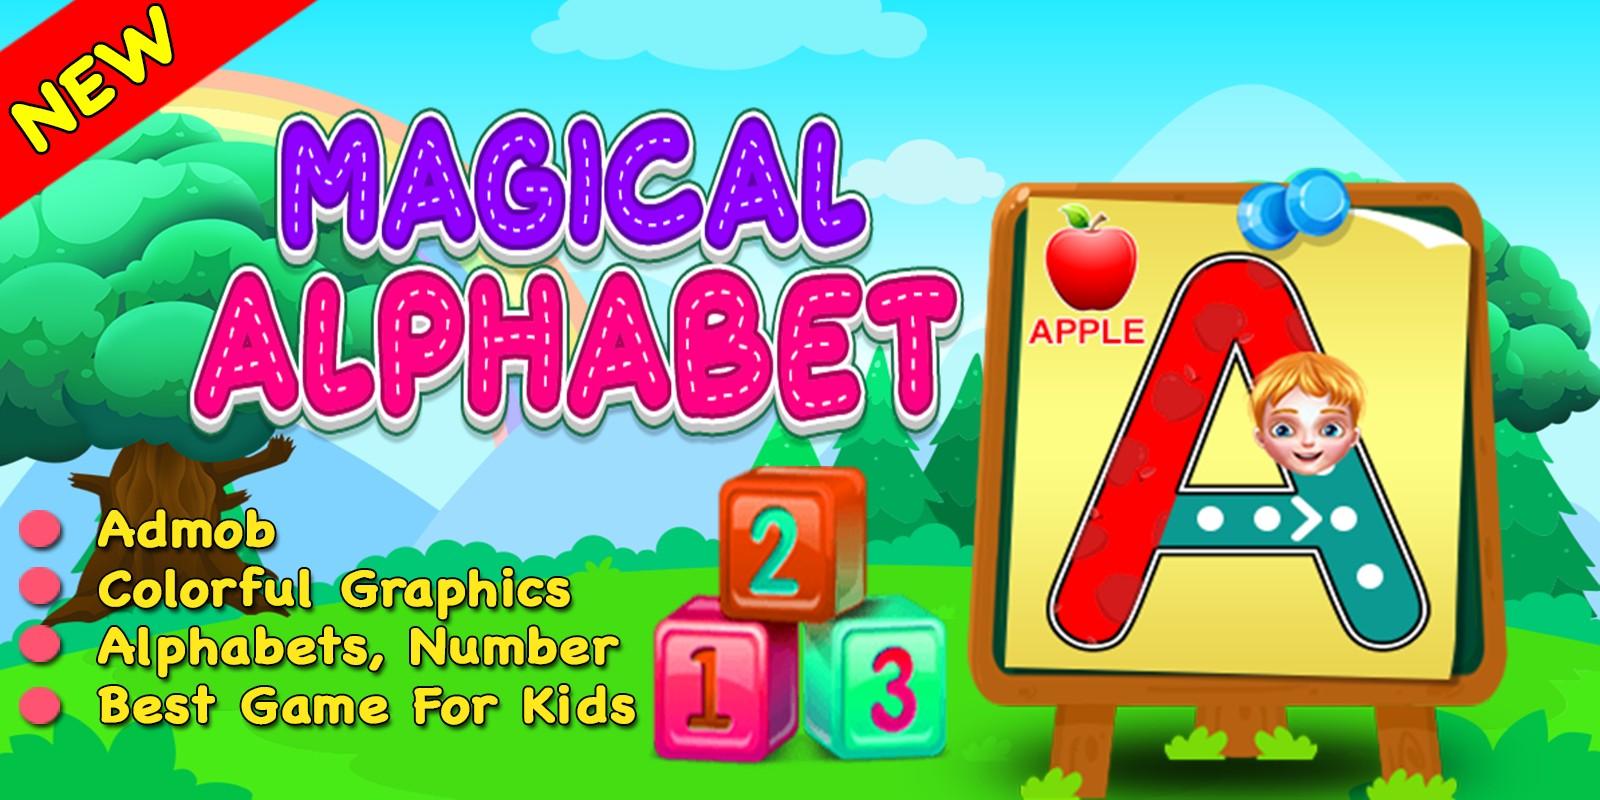 Magical Alphabets - Kids Education Game iOS